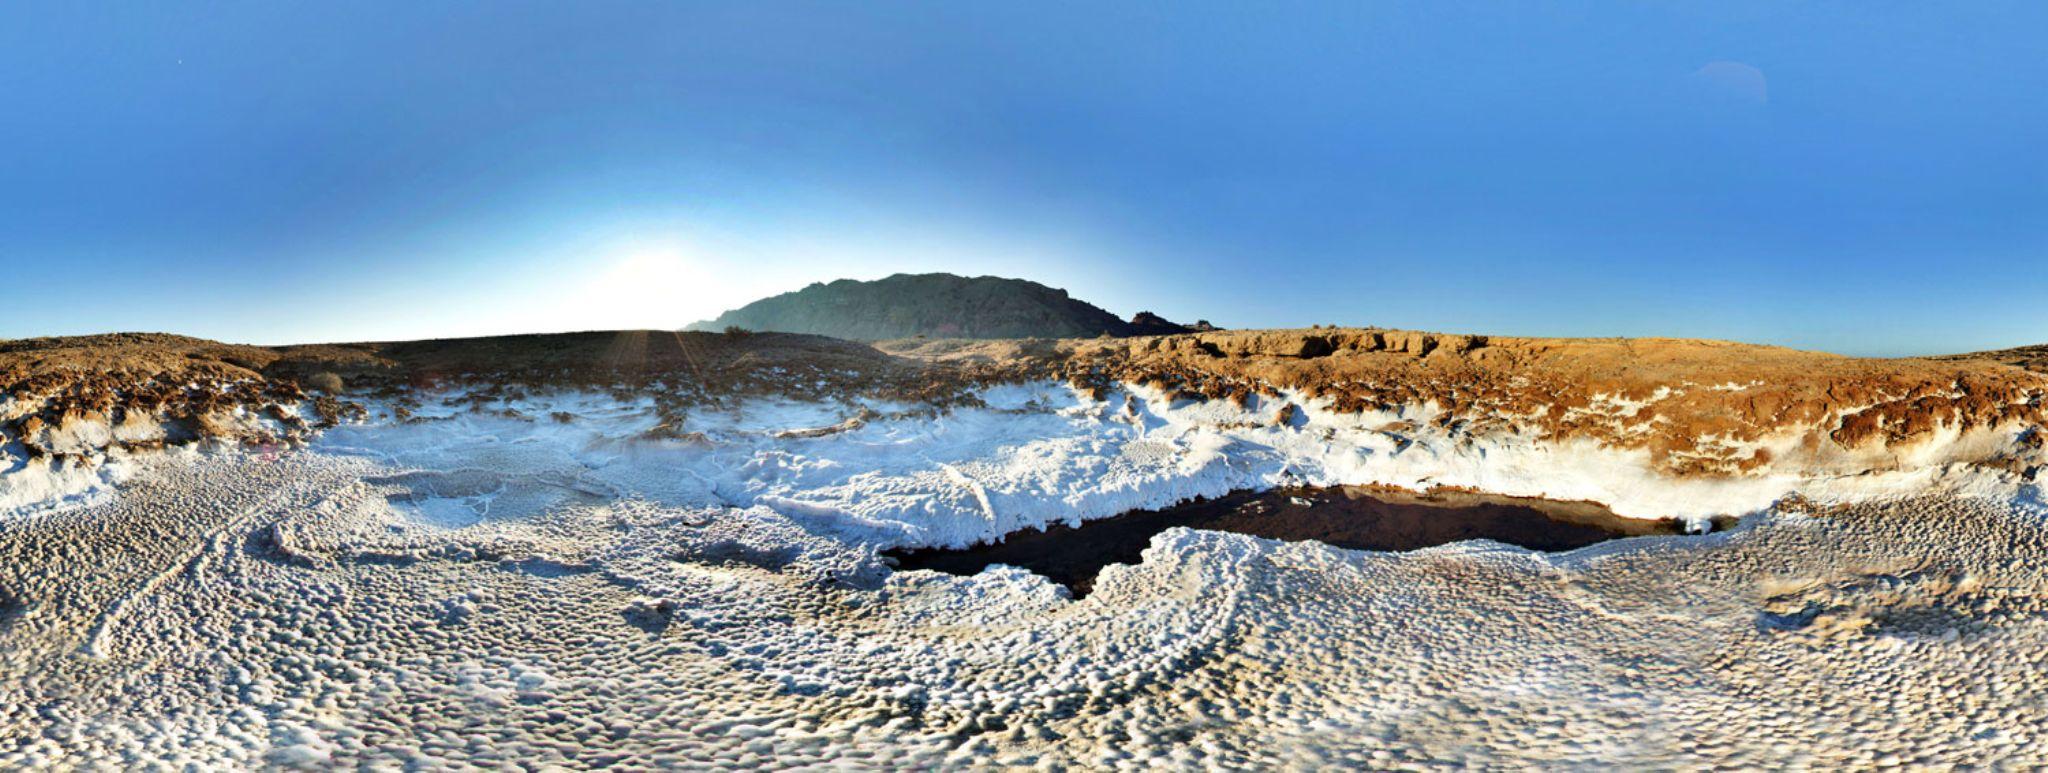 Salt Springs Qeshm iran by moslem faghih